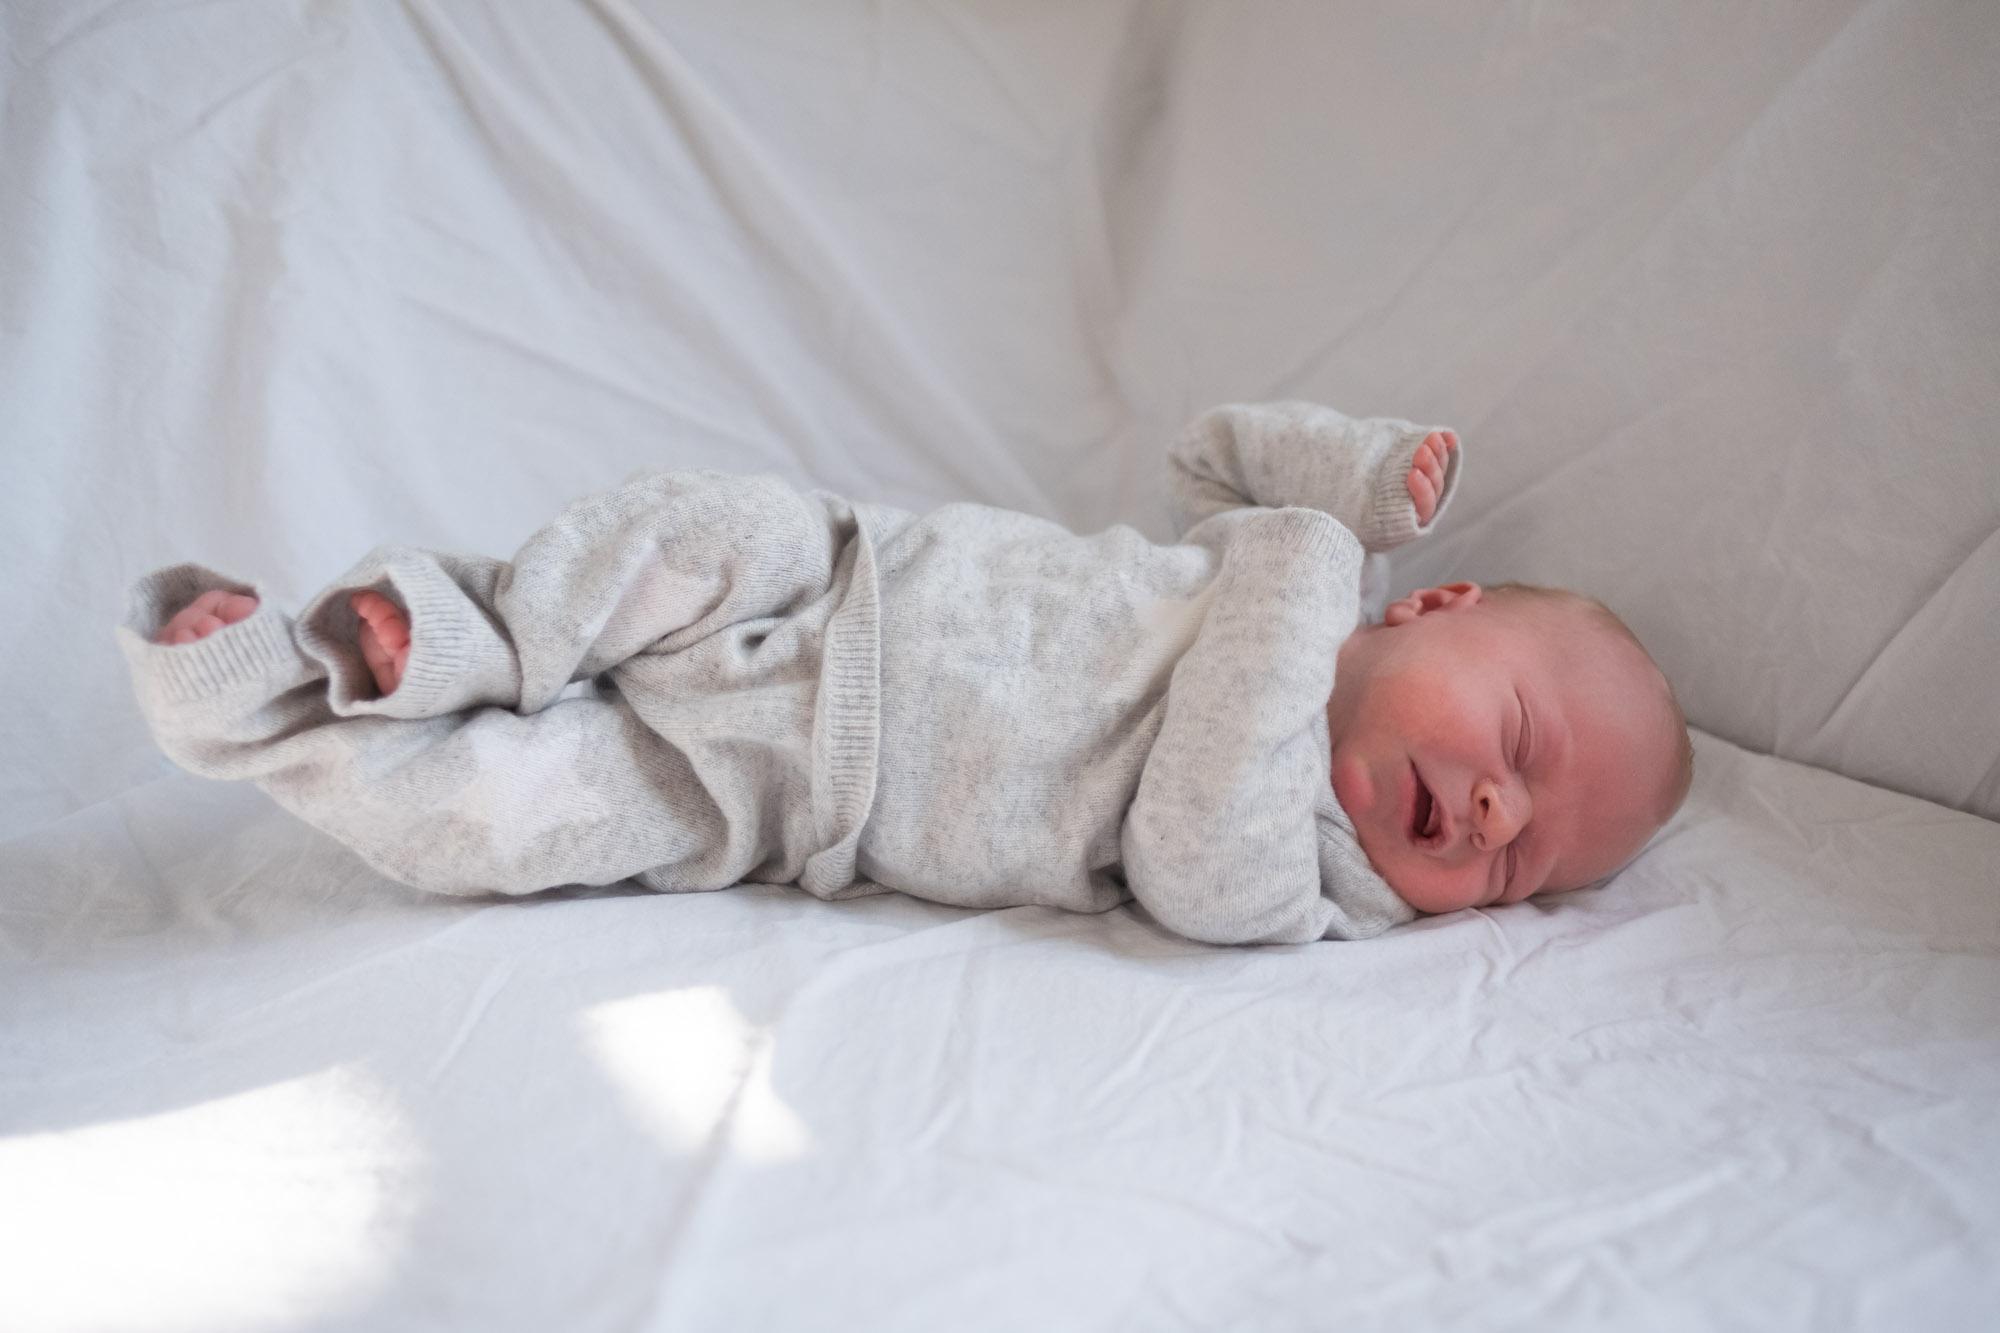 family-portrait-baby-photographer-082.jpg